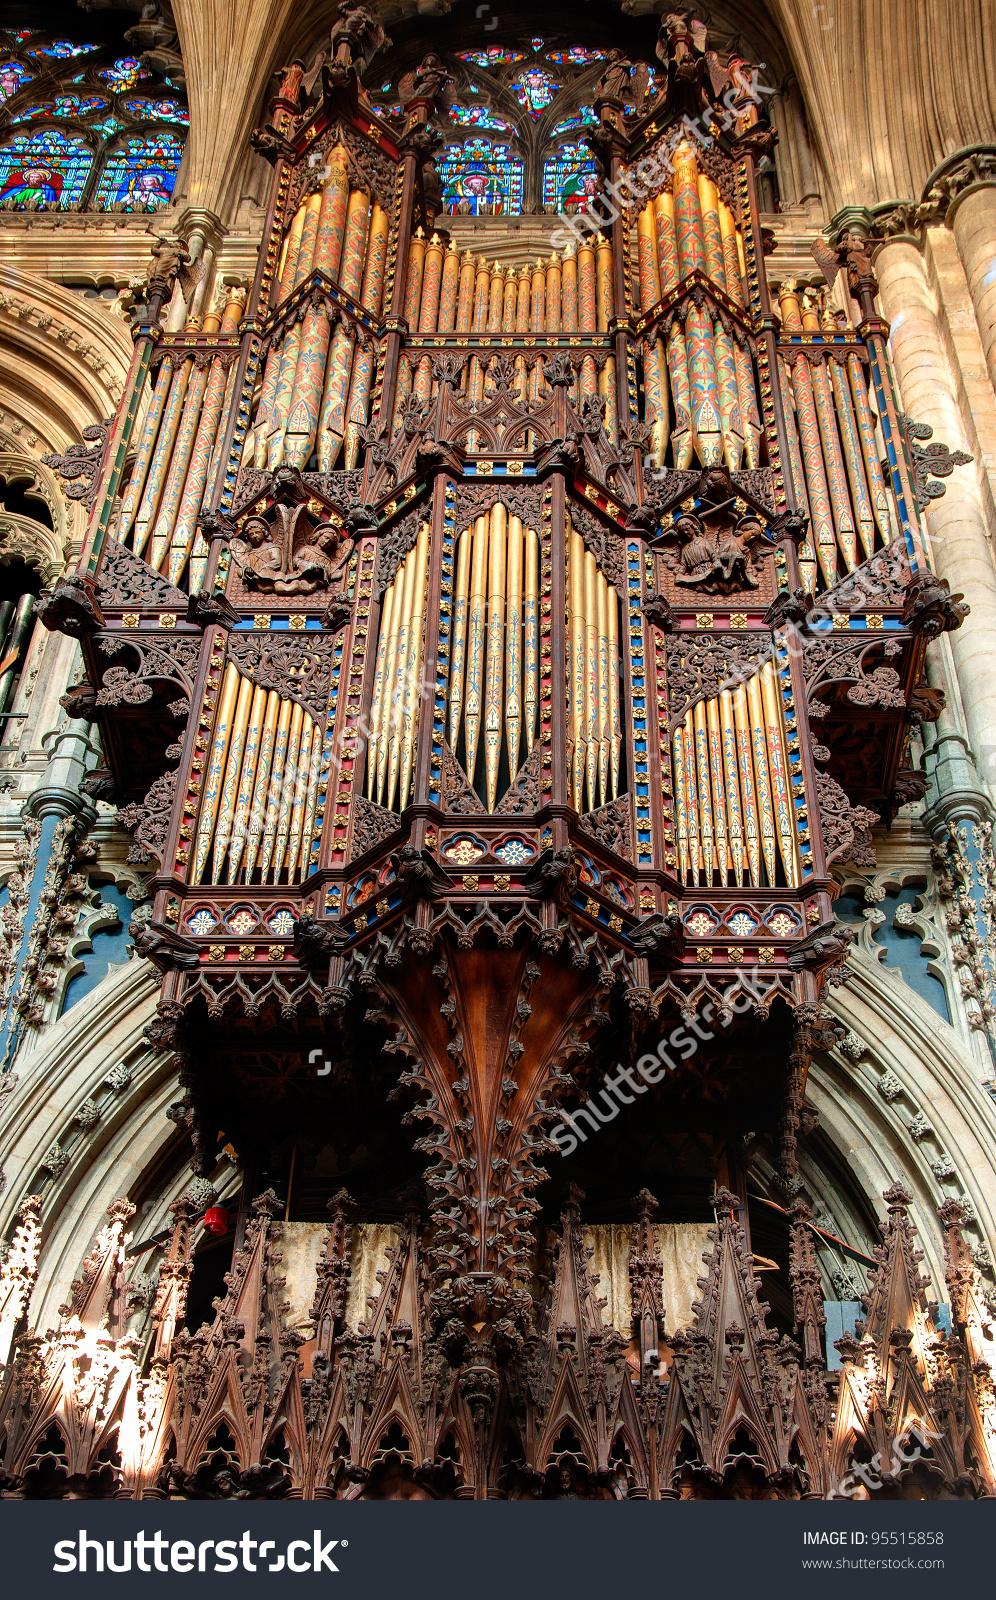 Church Organ Ely Cathedral Cambridgeshire England Stock Photo.